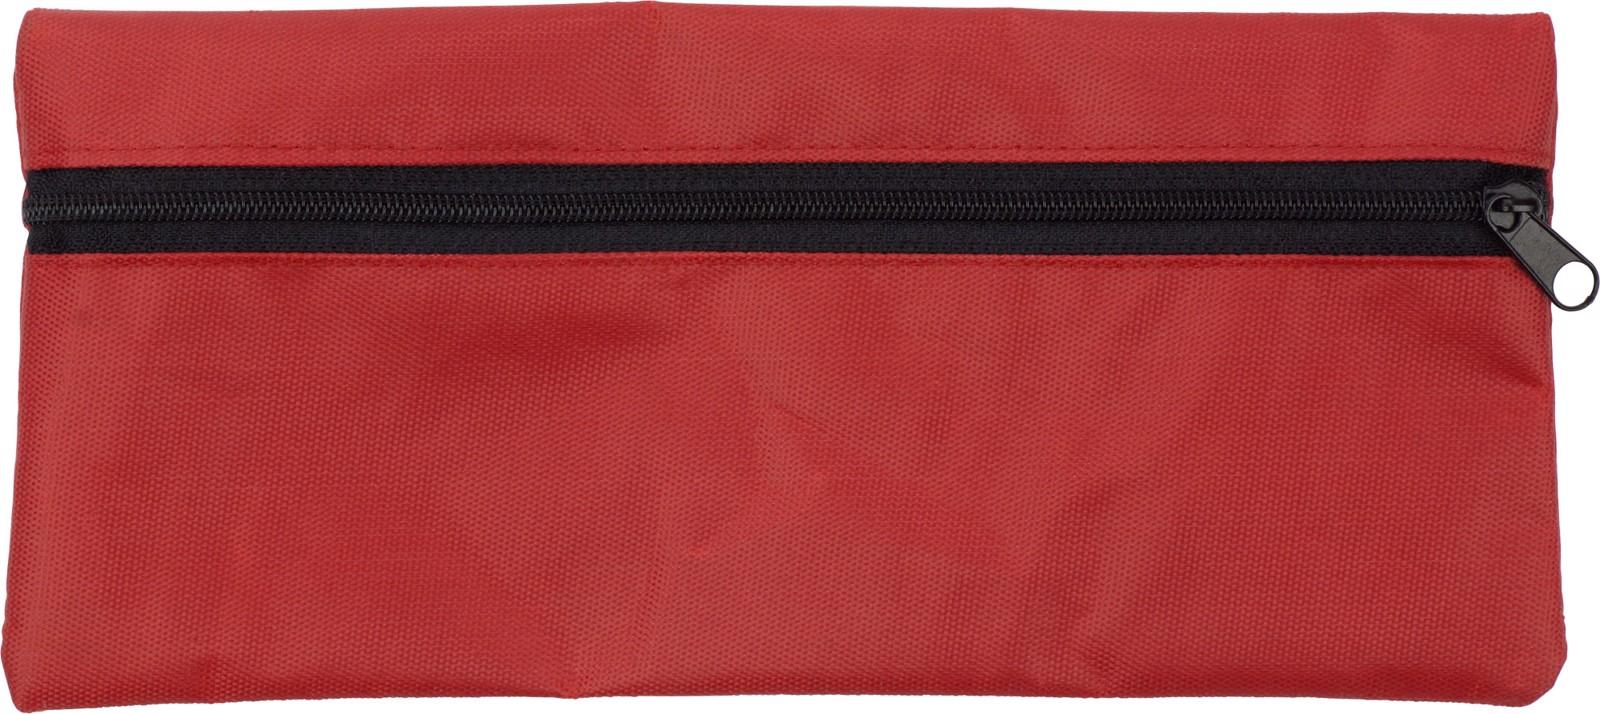 Nylon (420D) pencil case - Red